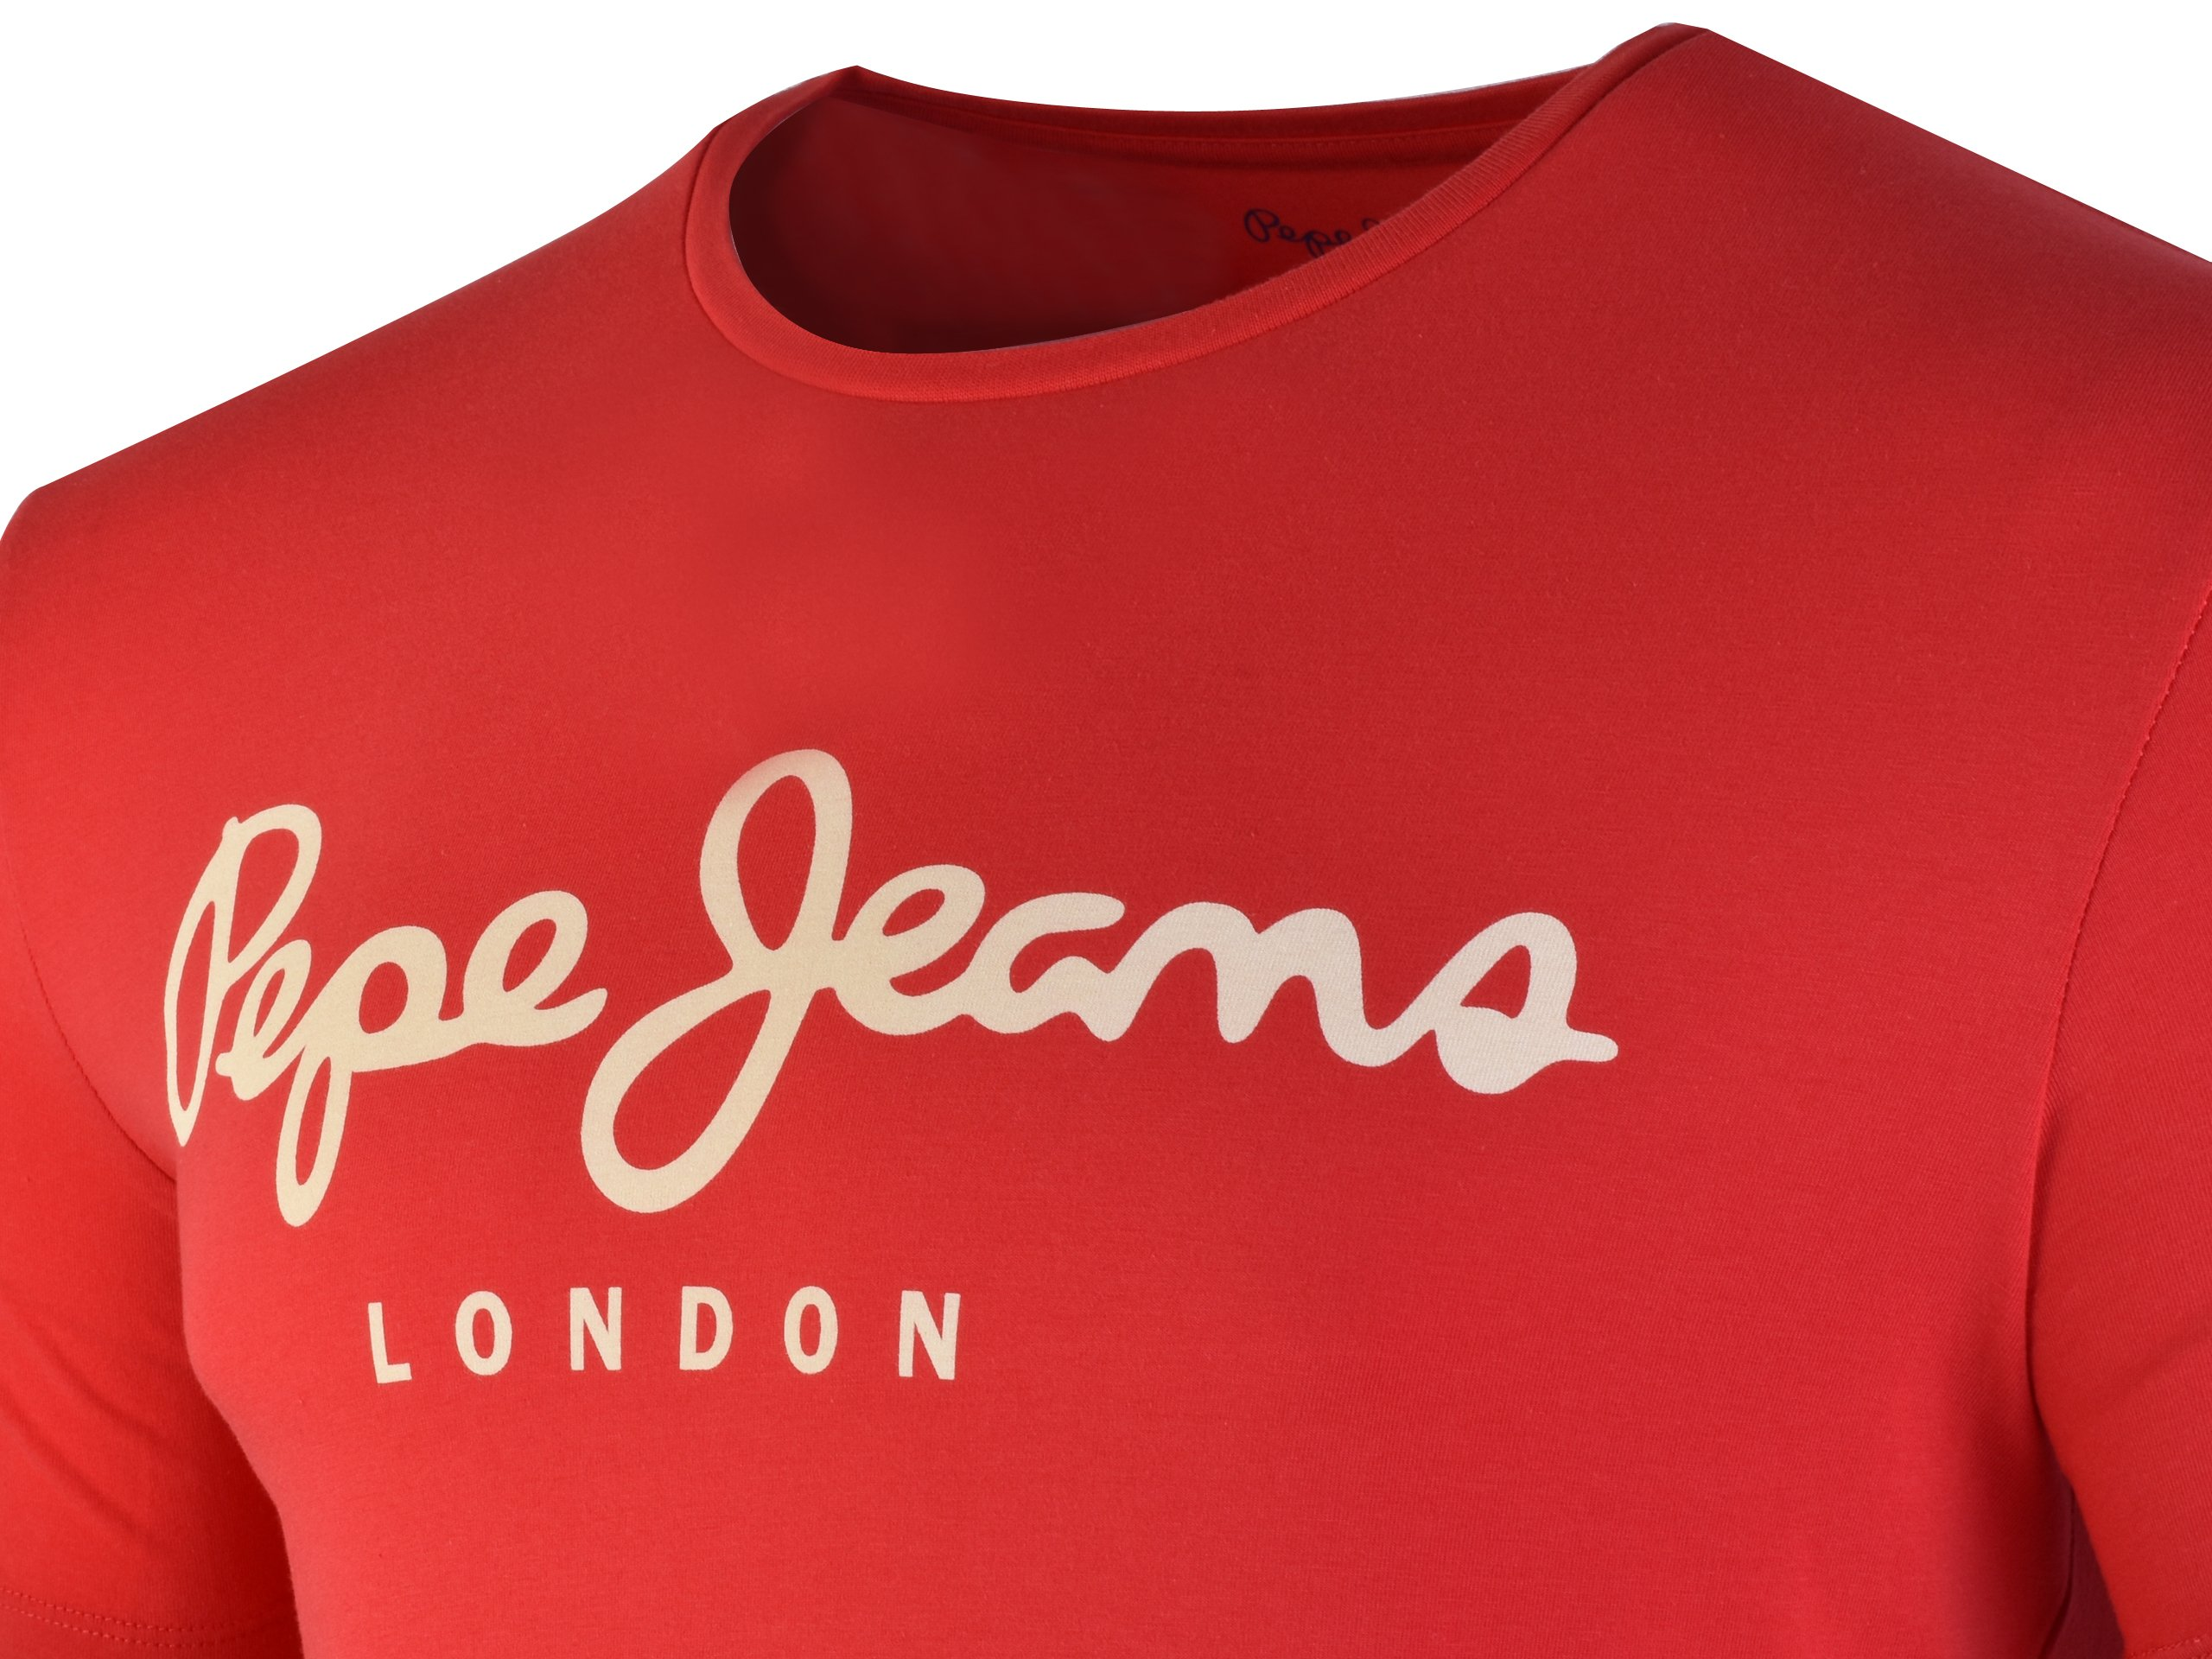 Pepe Jeans London Pm501594 254 T Shirt Red Czerwony Mens Pepe Jeans Kicks Sport A Trusted Supplier Of Branded Sports Footwear